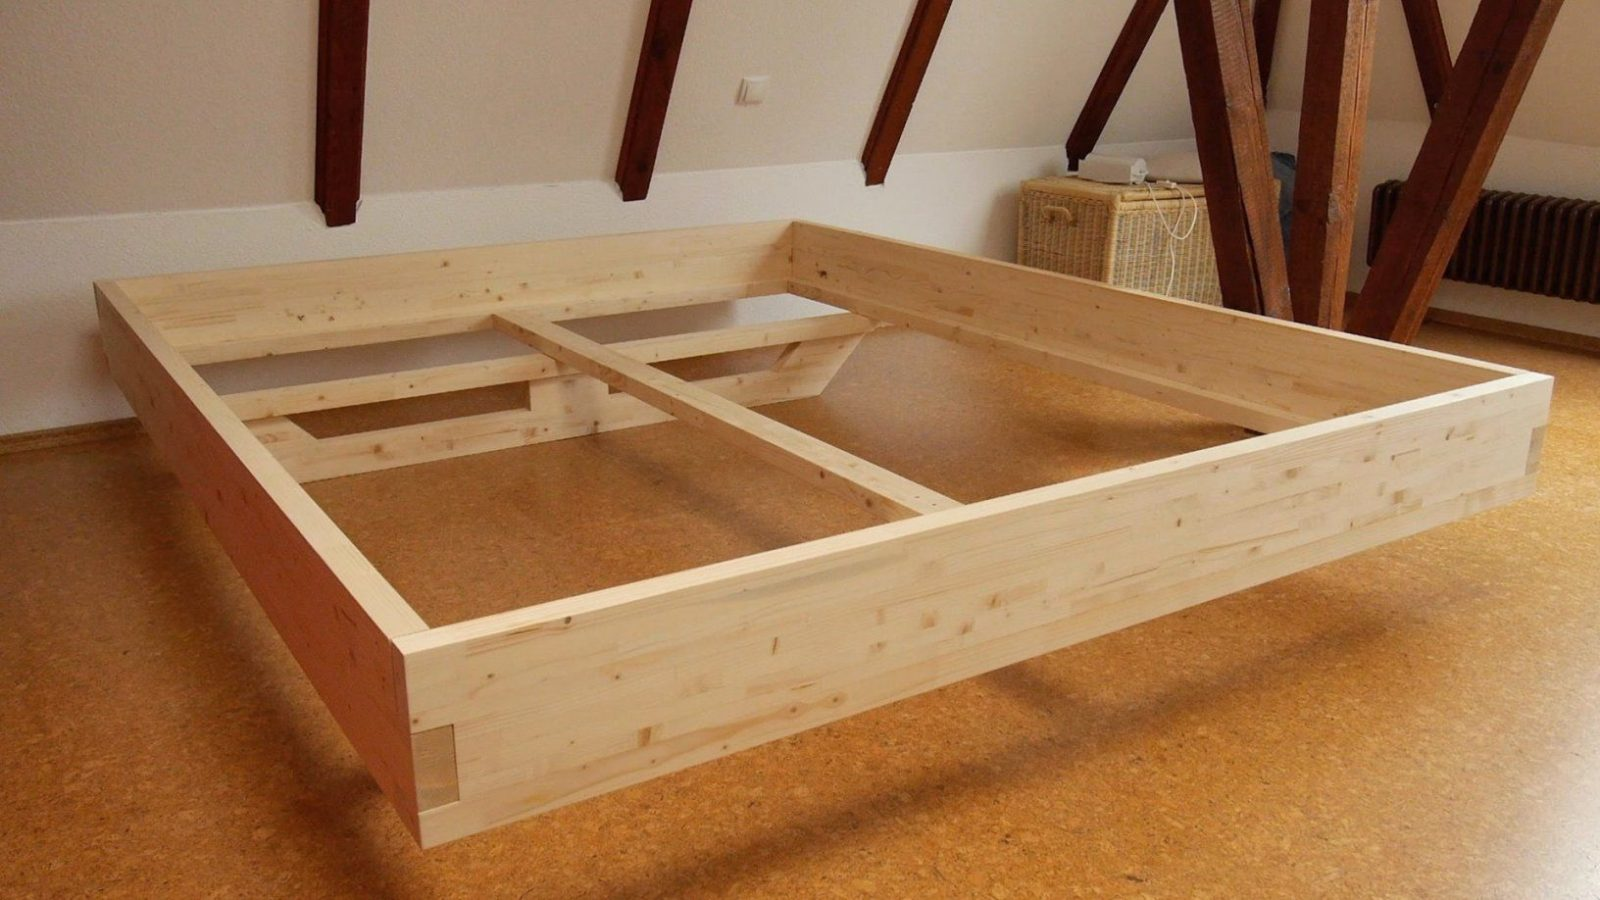 Rausfallschutz Kinderbett Selber Bauen Cl84 Hitoiro Avec Wohnmobil von Coole Betten Selber Bauen Bild